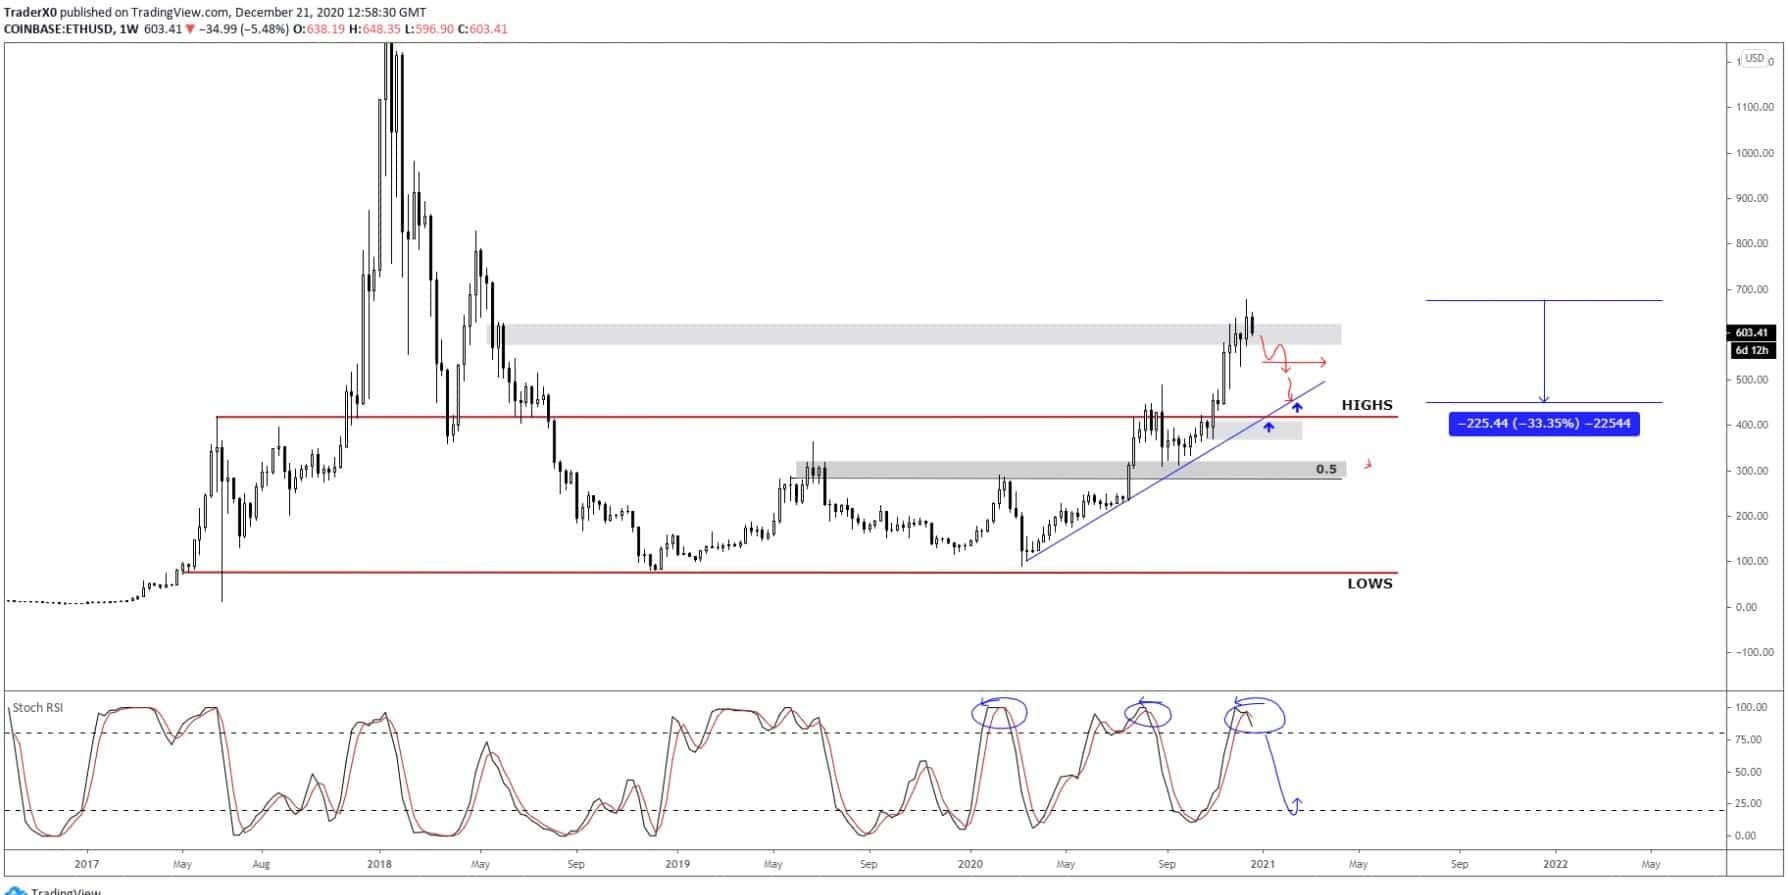 Ethereum Weekly Price Chart 12.22.20 via Trader XO @ TradingPrice.com